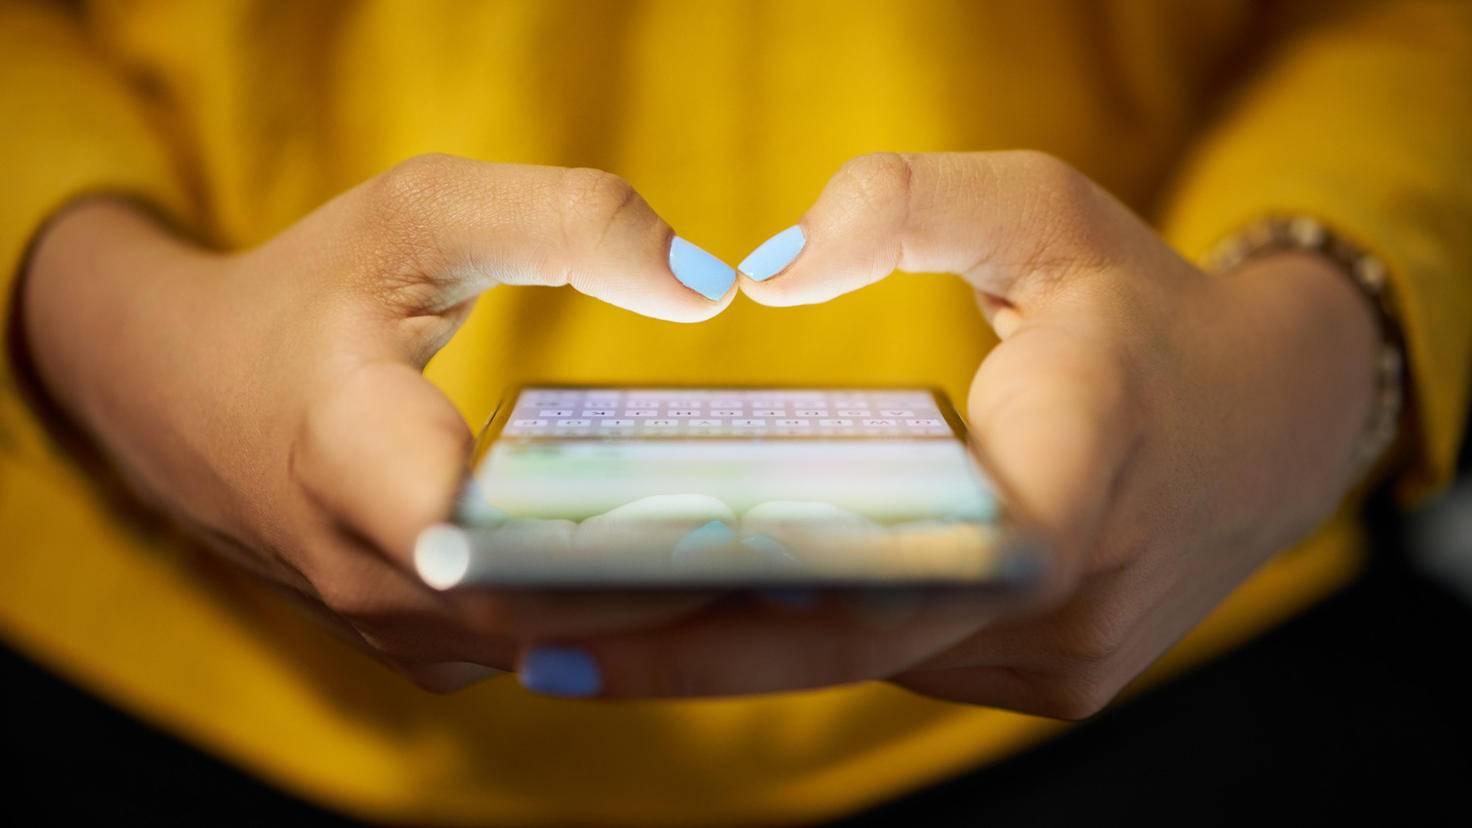 Smartphone Hand 598912704 iStock